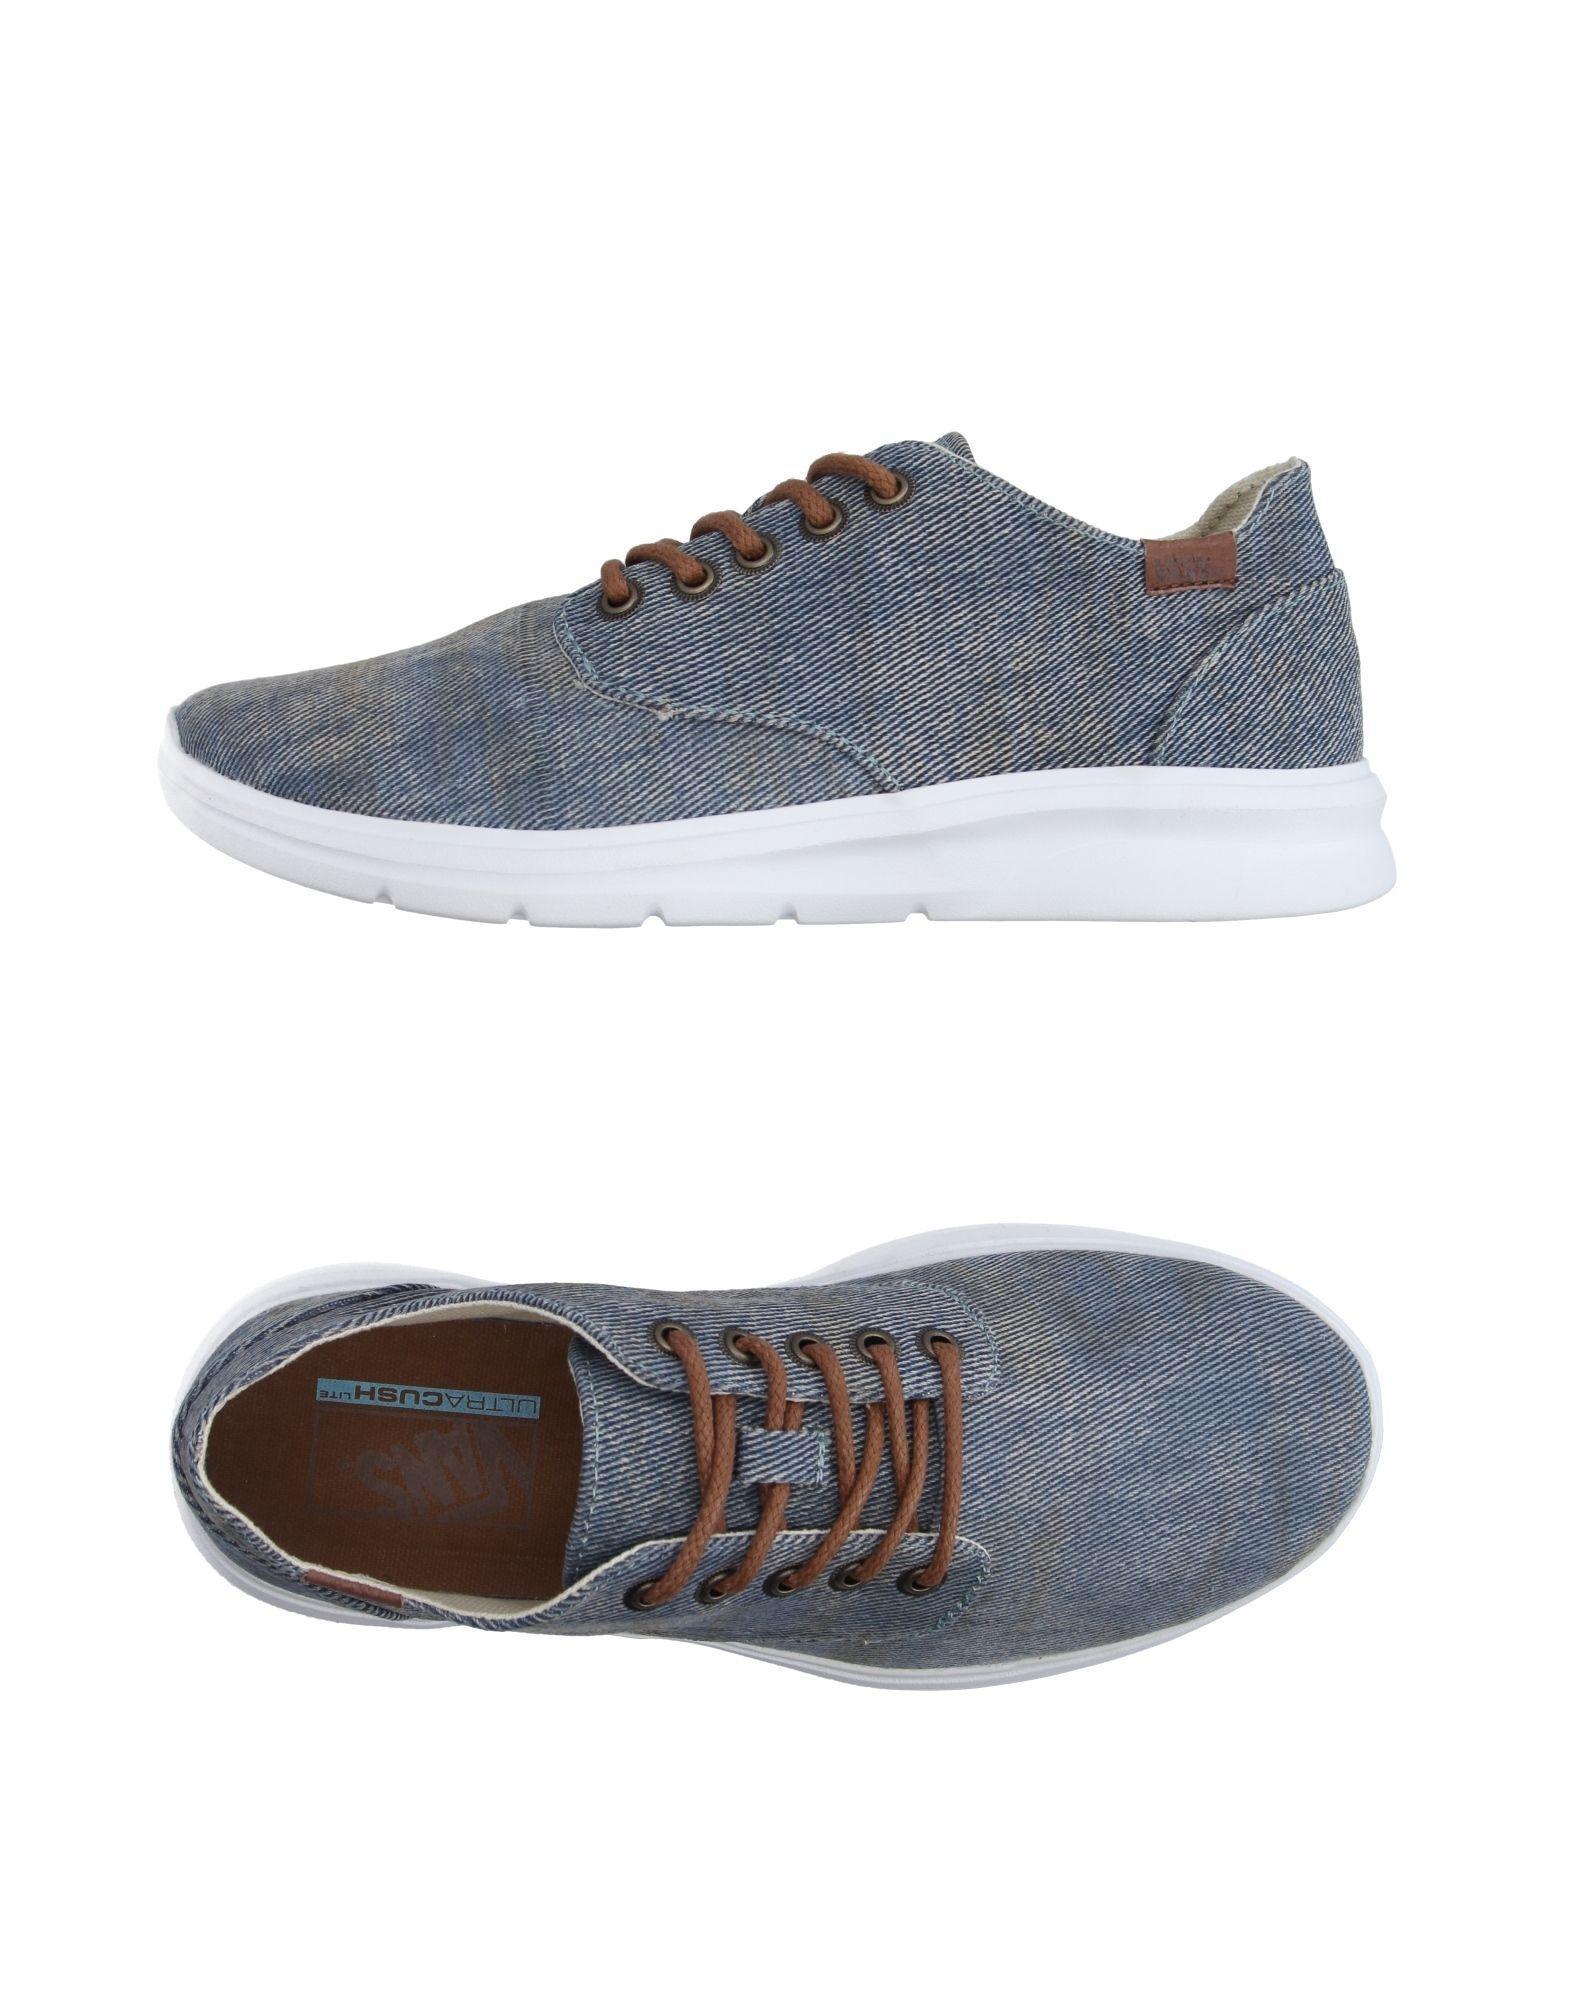 vans low tops sneakers in blue for men lyst. Black Bedroom Furniture Sets. Home Design Ideas